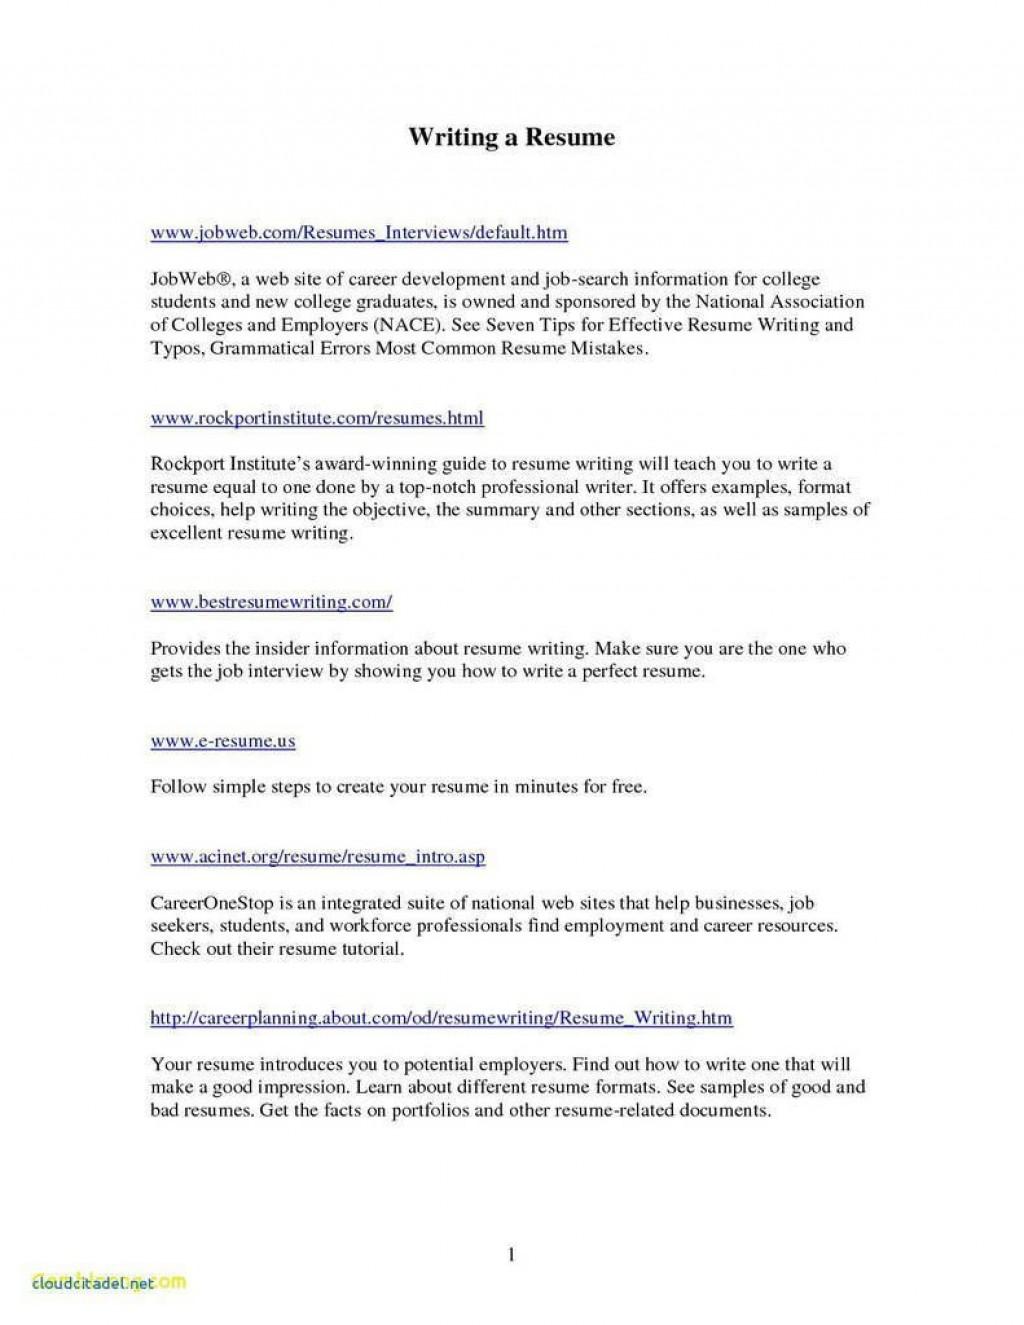 009 Phenomenal Letter Of Understanding Sample Format Inspiration Large